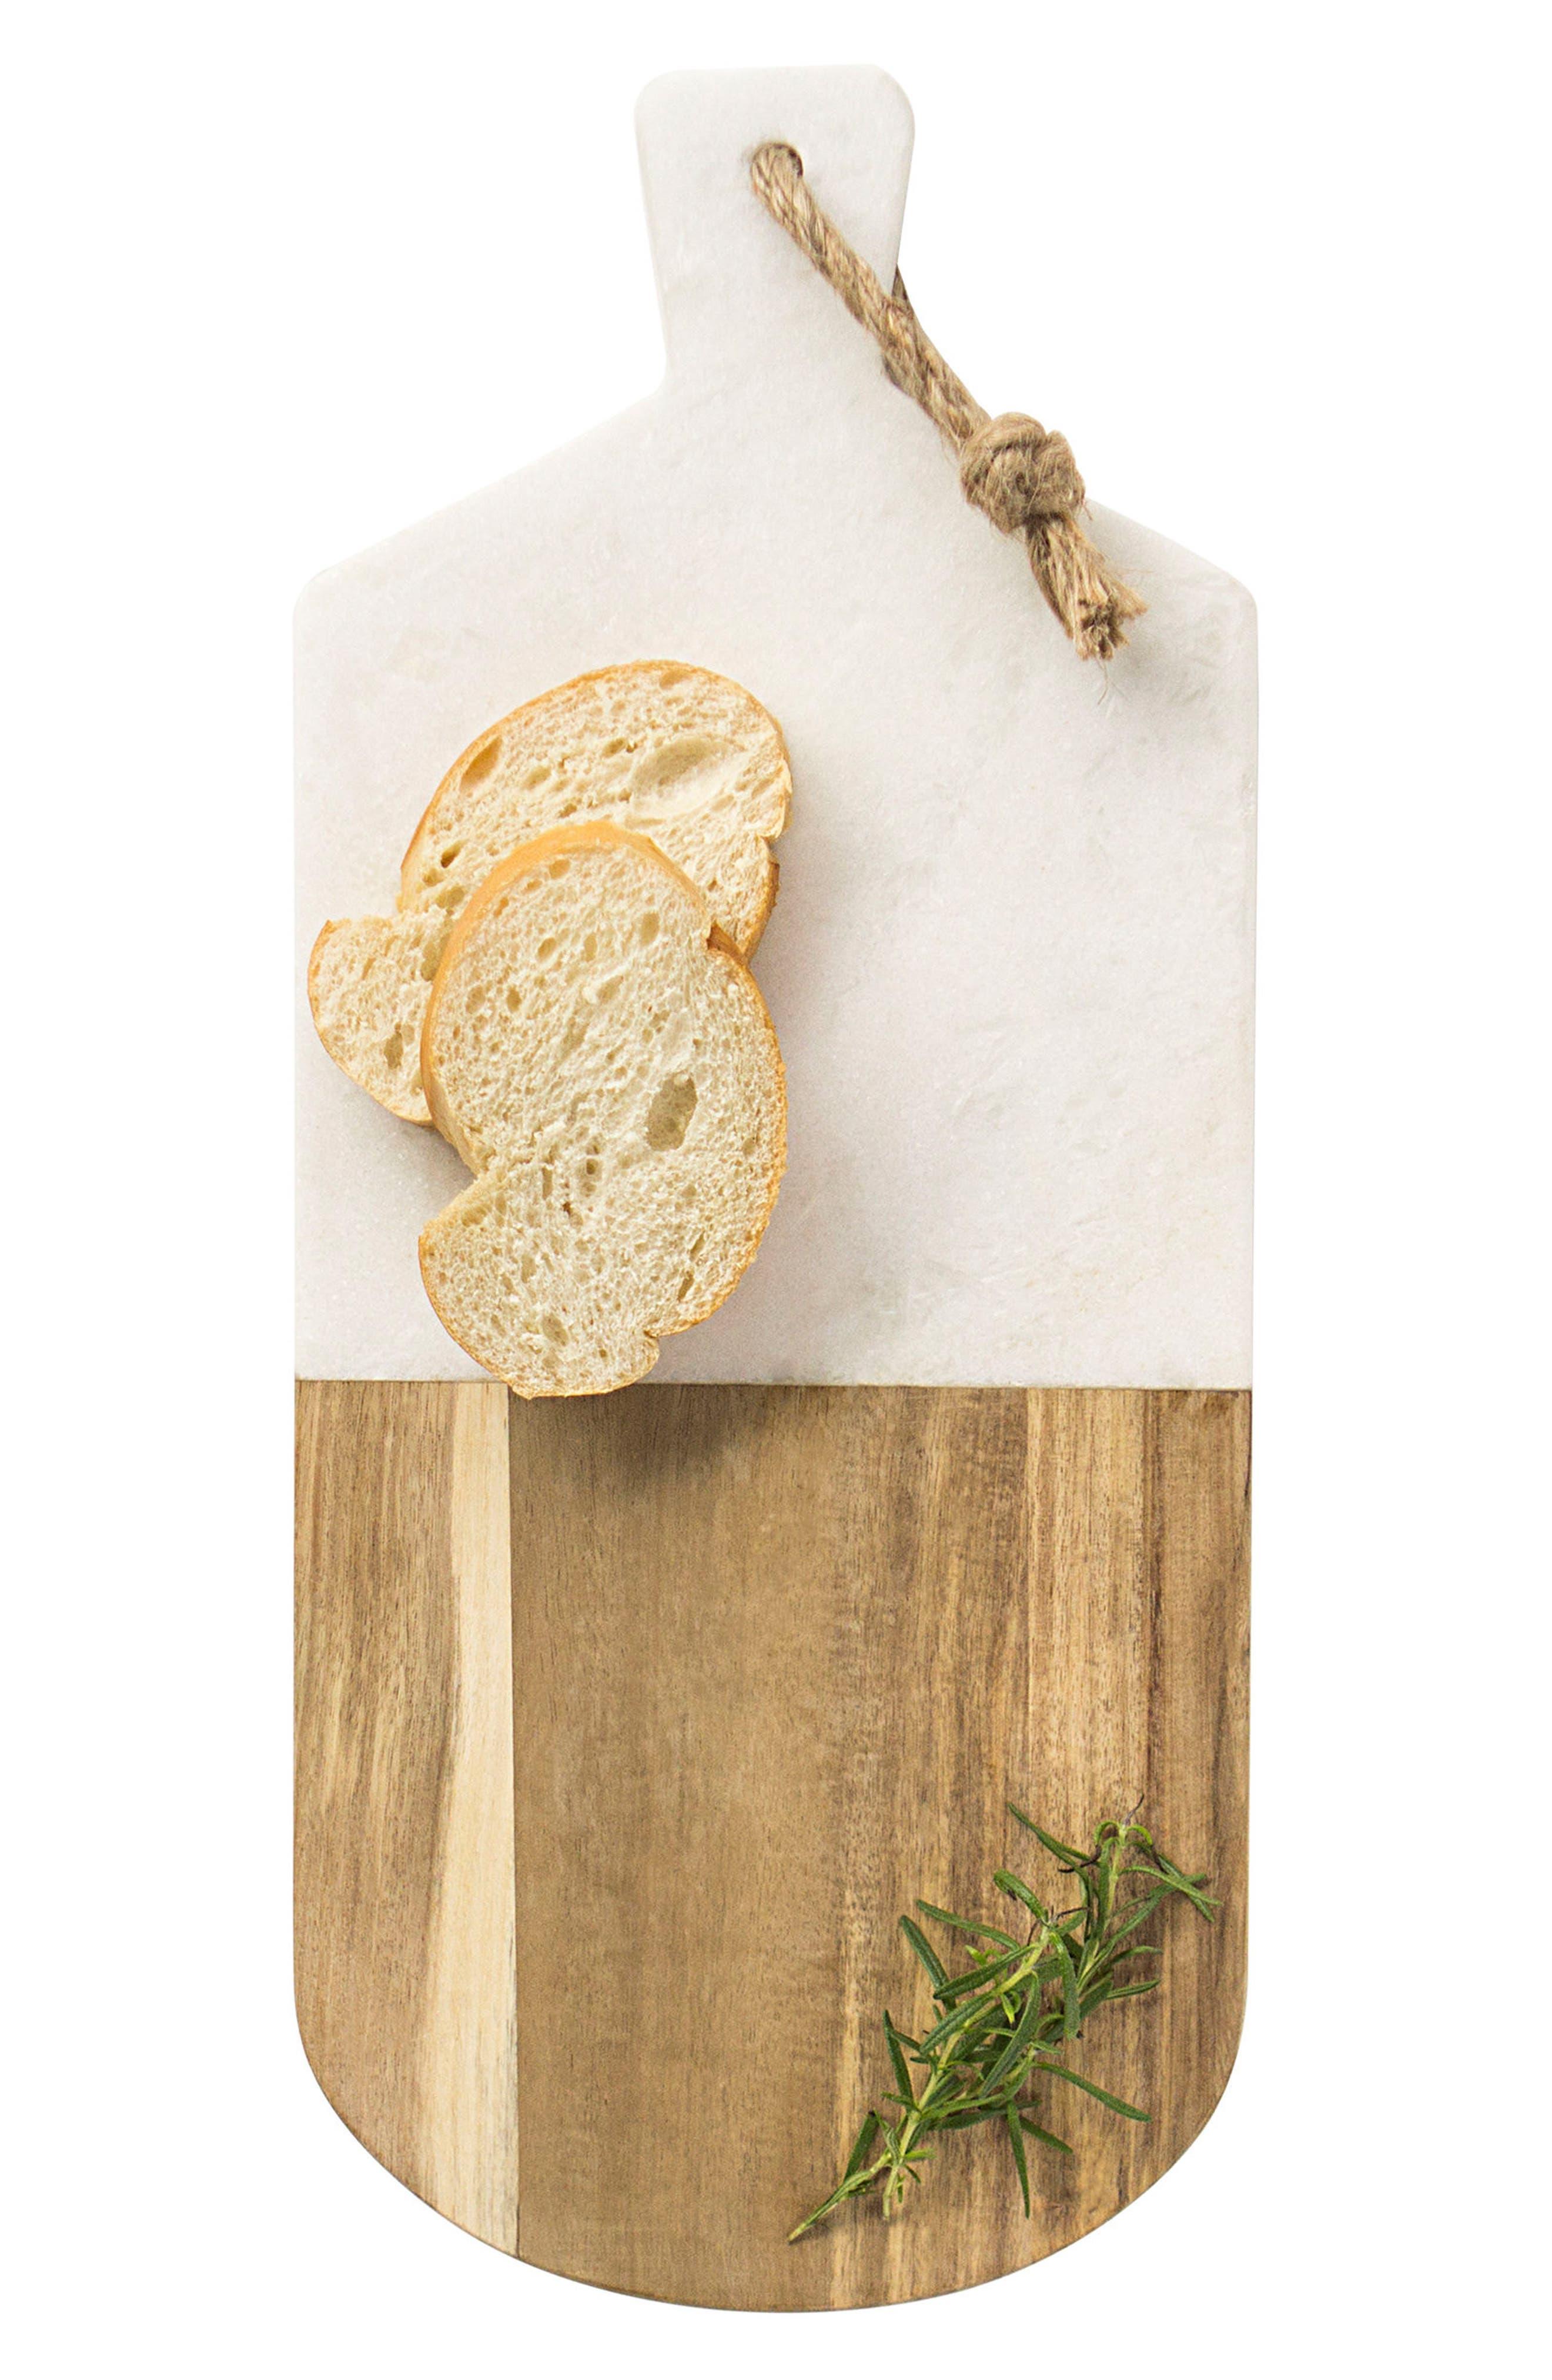 Monogram Marble & Wood Serving Board,                         Main,                         color, BROWN